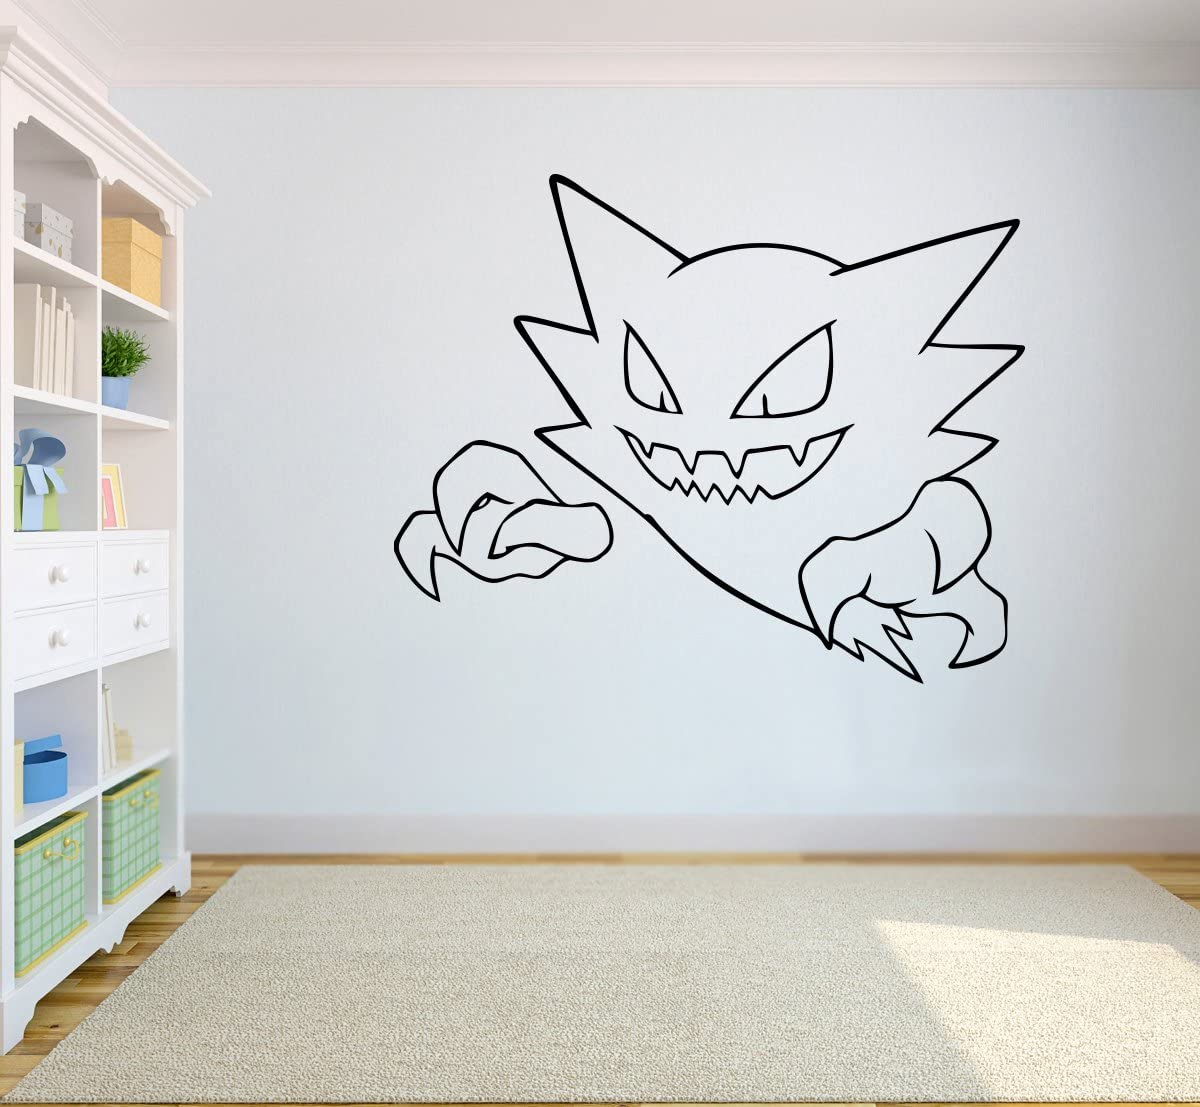 №093 Haunter Art Vinyl Sticker Pokemon GO Wall Mural Pokemon Wall Vinyl Decal Home Interior Decor Nursery Image 93